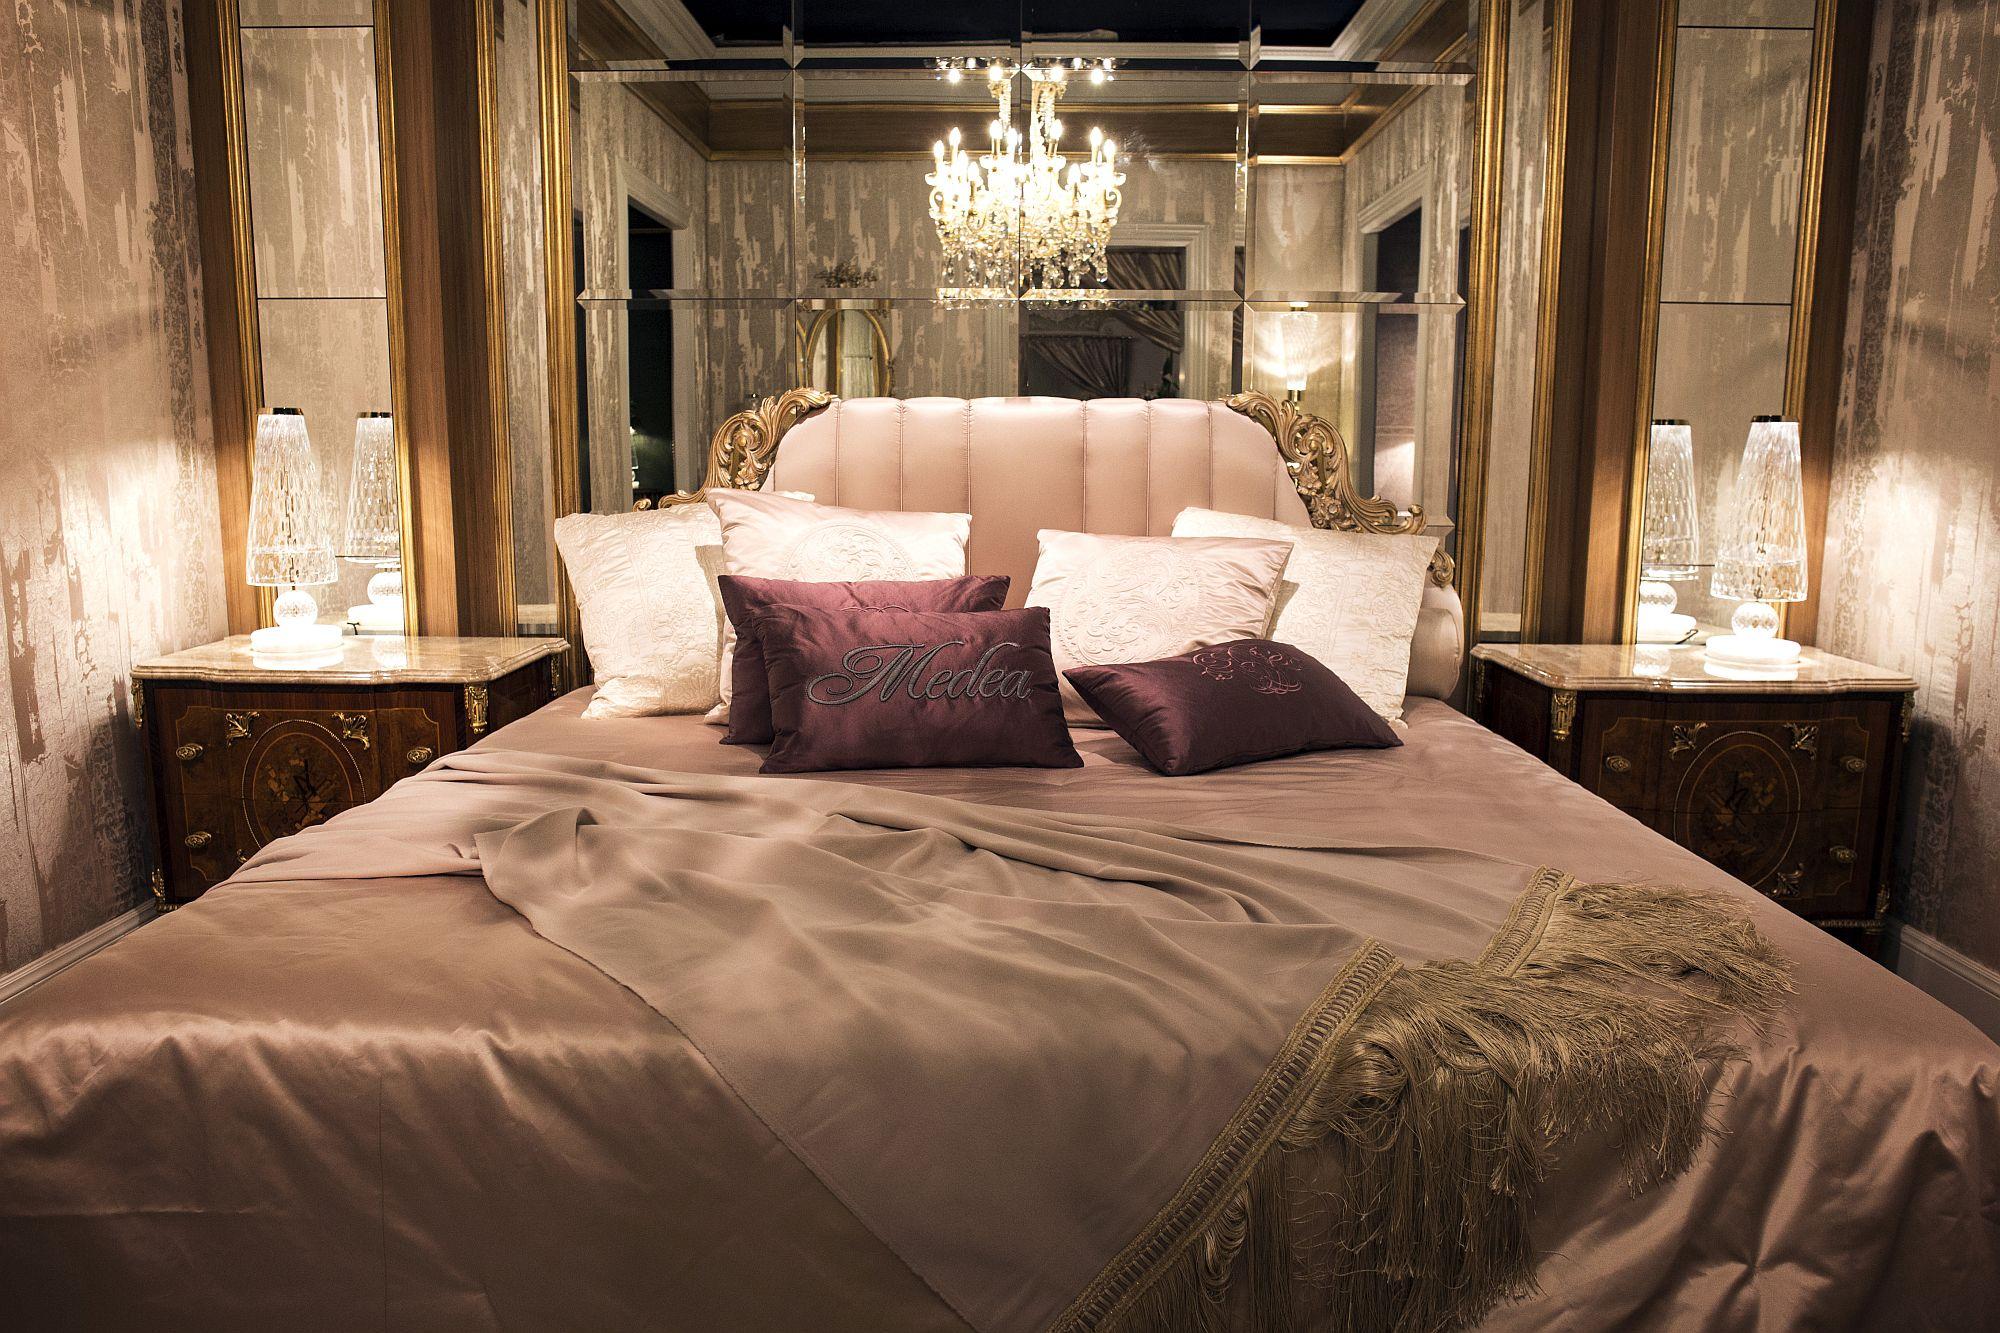 Ultra-luxurious bedroom decor from Medea